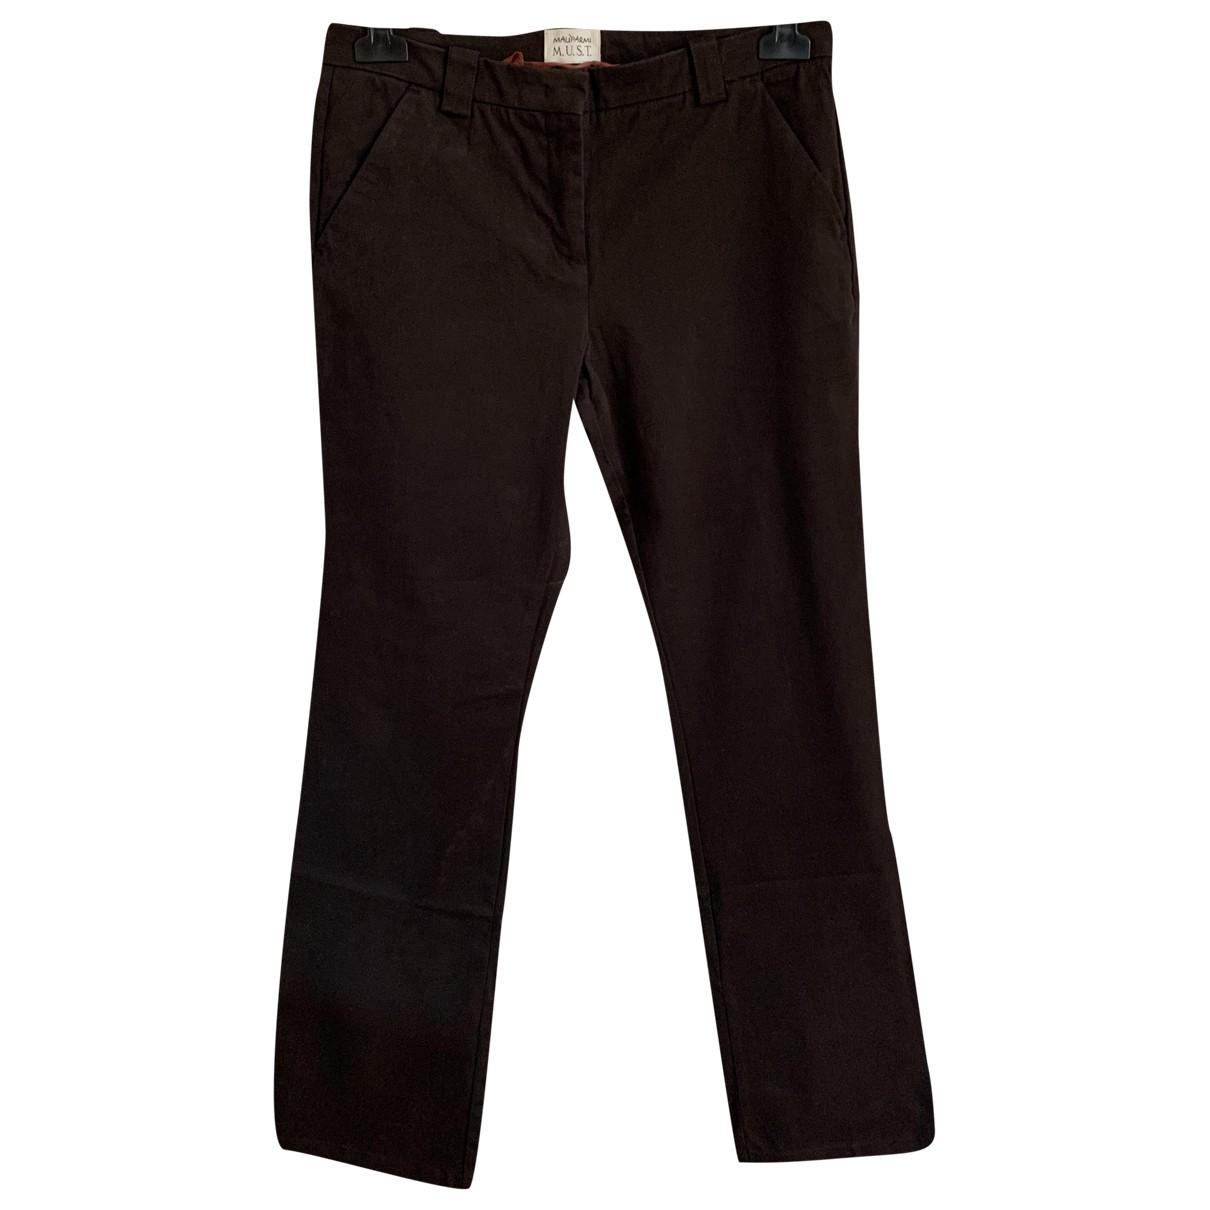 Pantalon recto Maliparmi